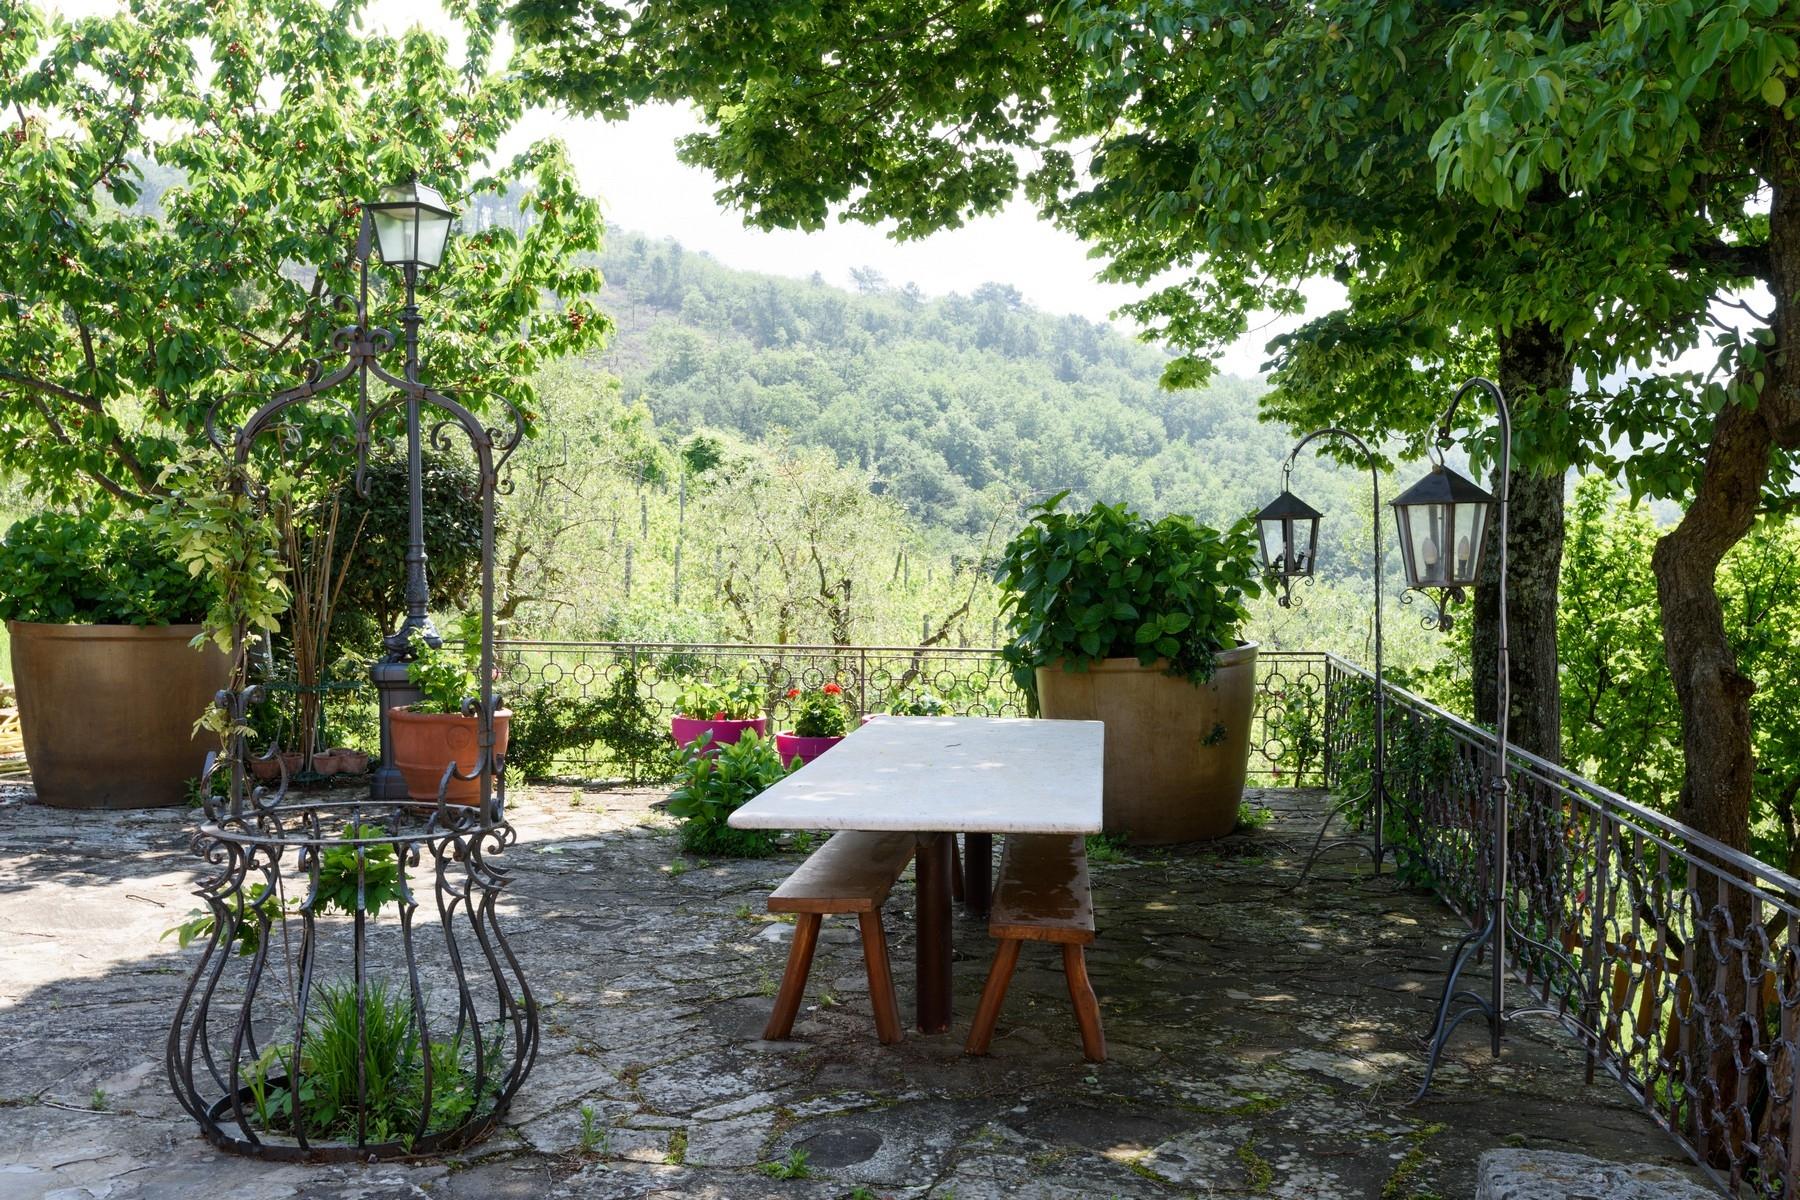 Villa in Vendita a Greve In Chianti: 5 locali, 491 mq - Foto 3